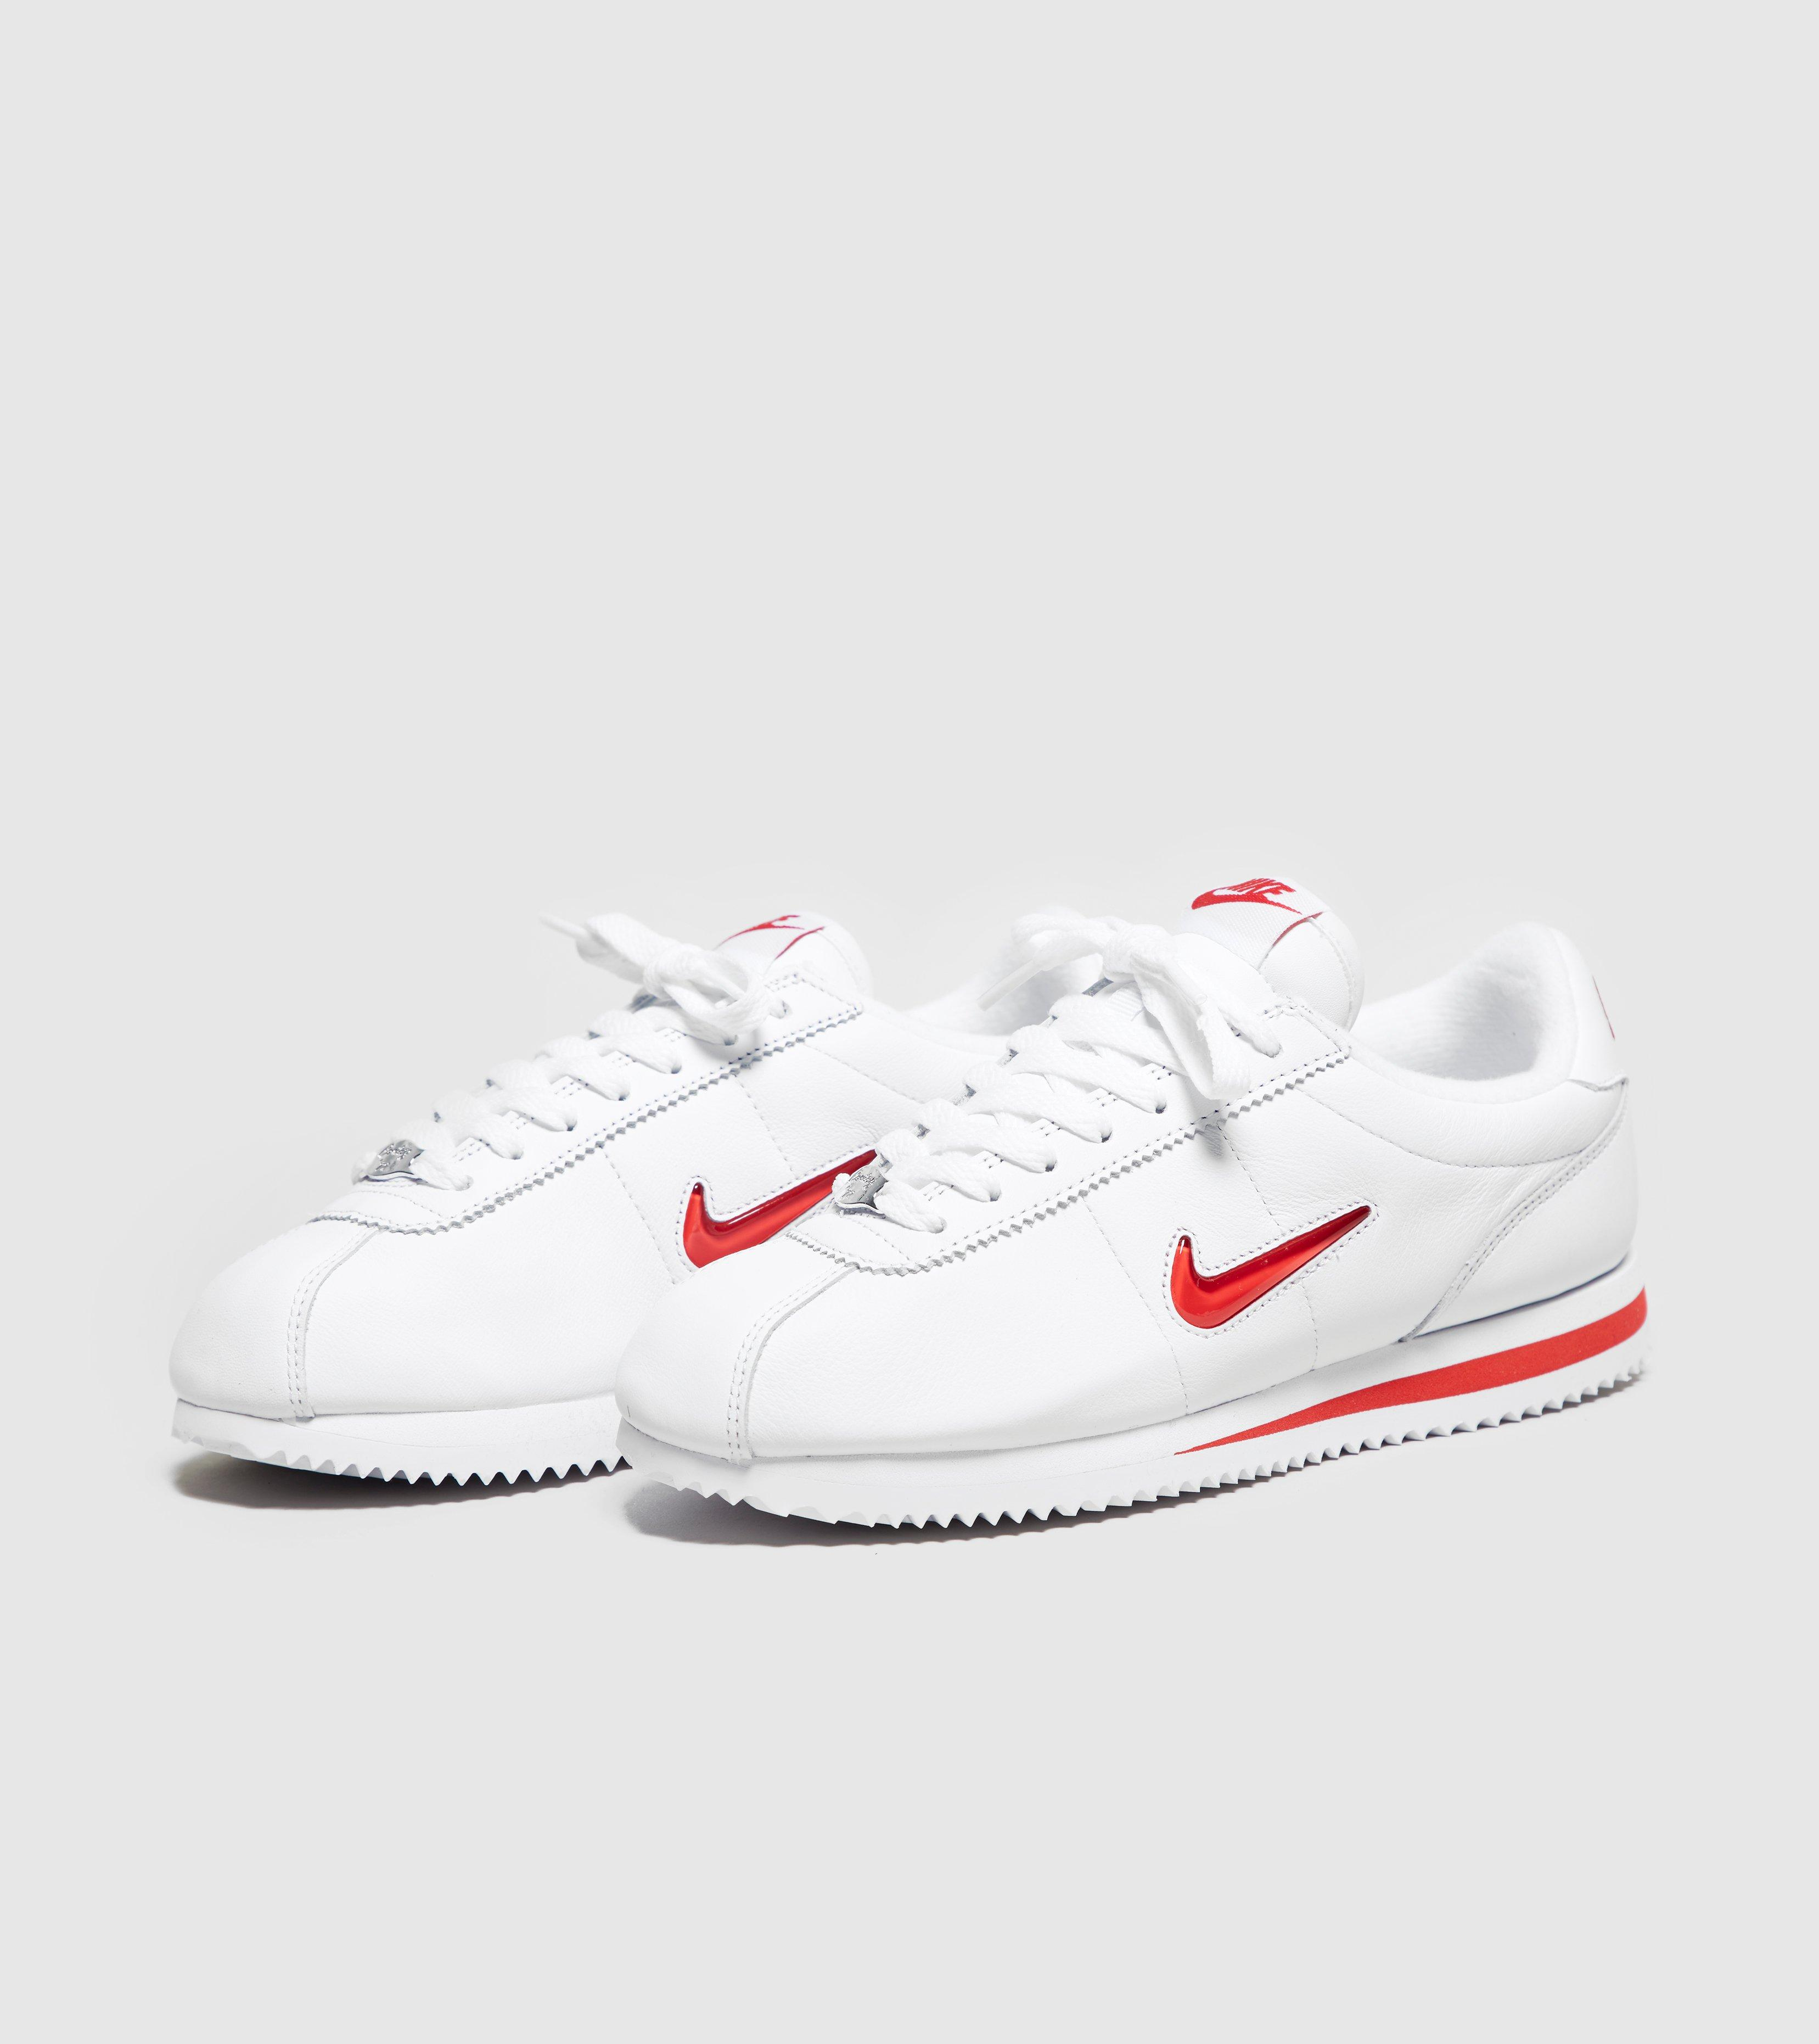 adb2de20da228 Nike Roshe Runs Speckled